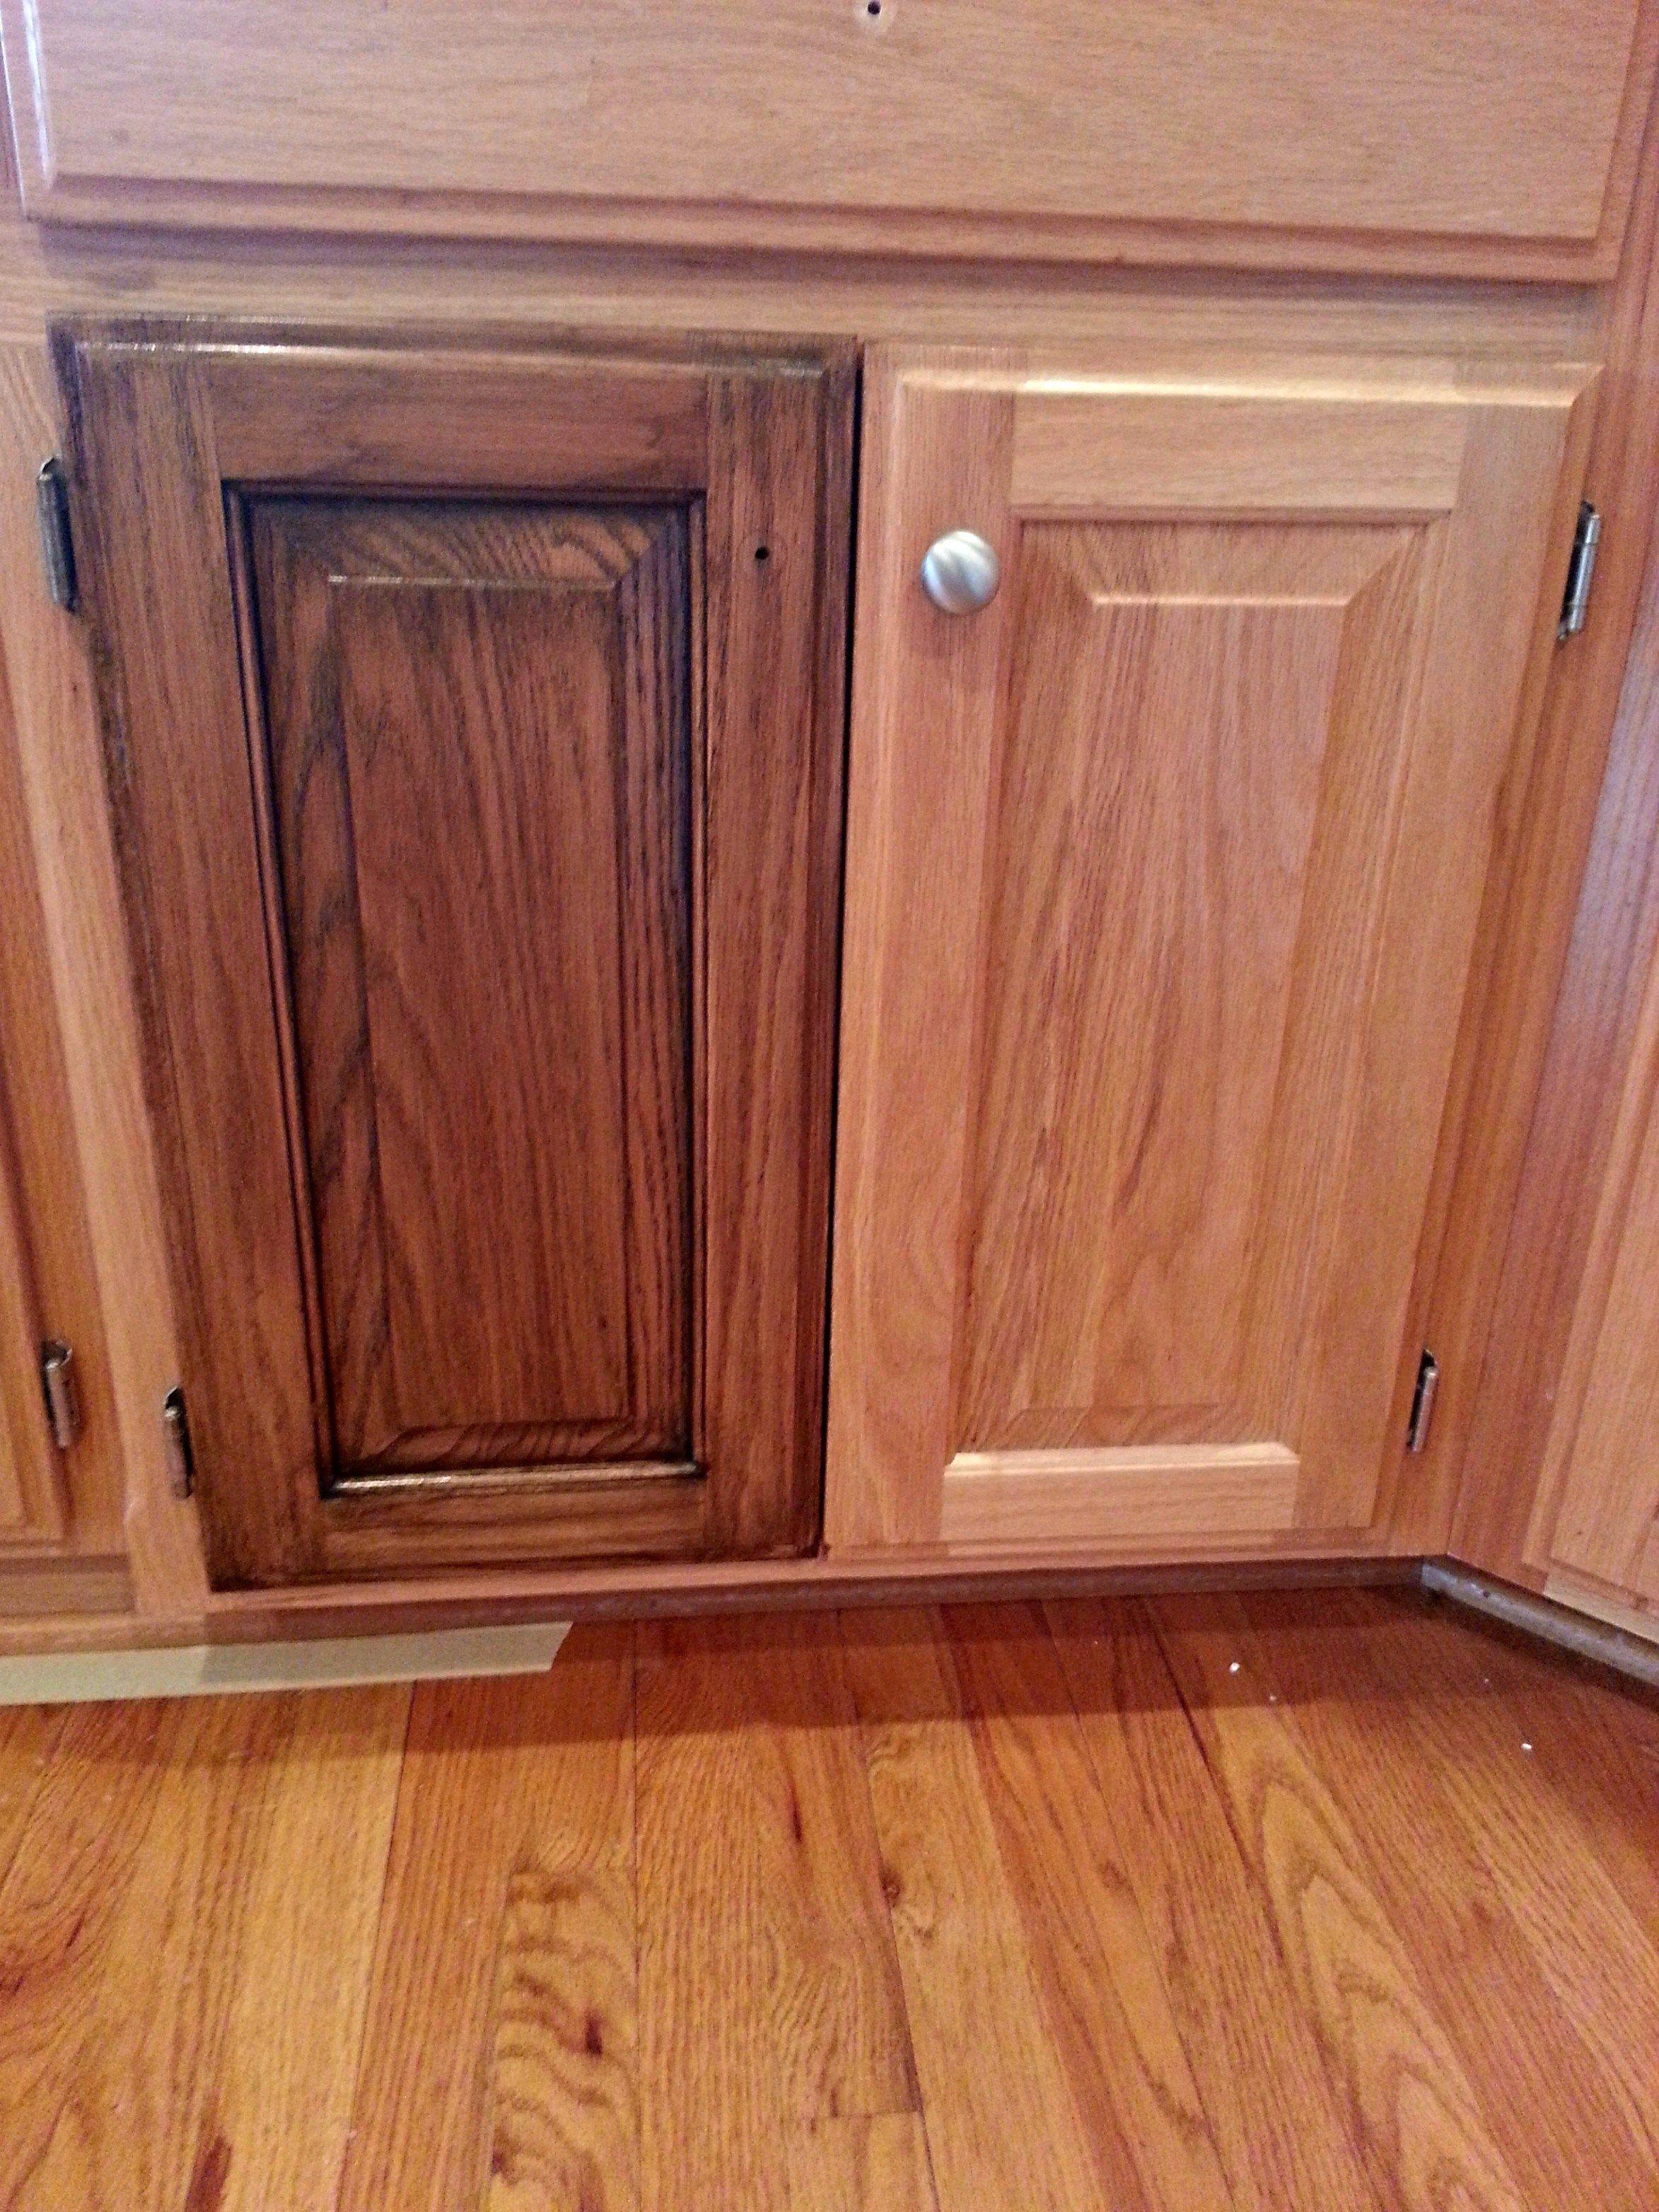 Staining Kitchen Cabinets Darker Buffet For Cabinet Restaining Dark Walnut Stain And